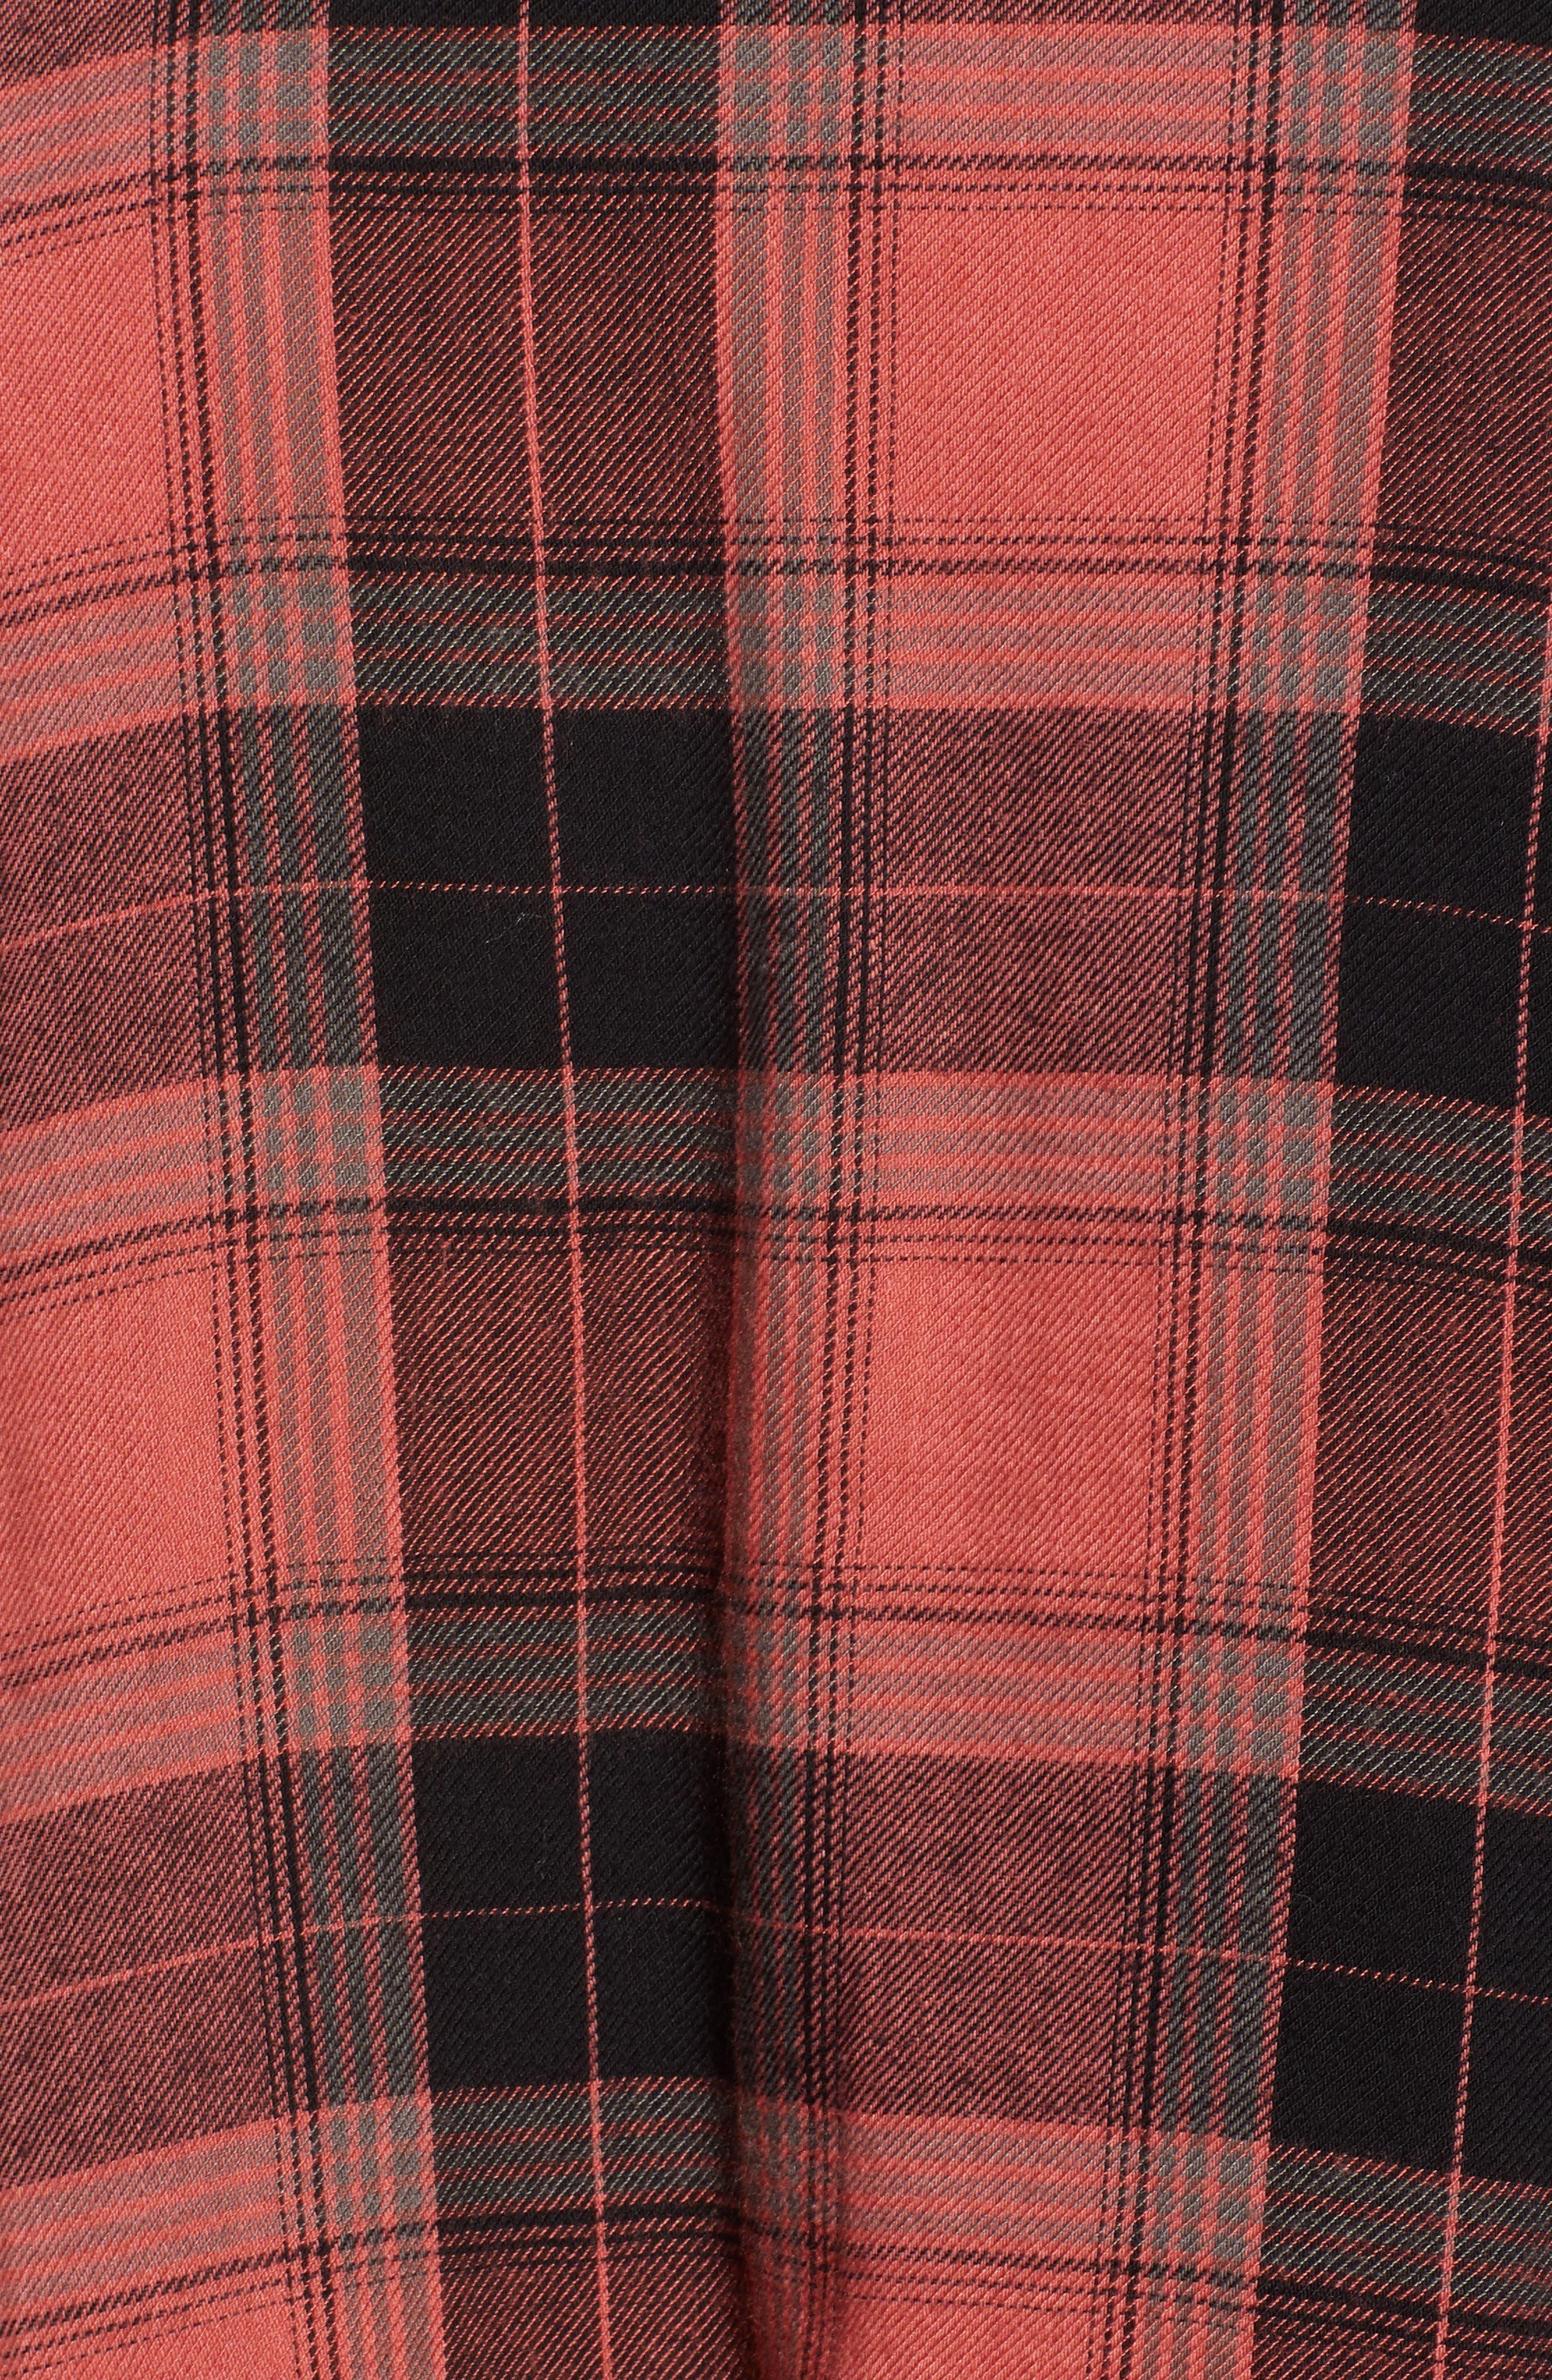 Plaid Peplum Shirt,                             Alternate thumbnail 6, color,                             PINK CEDAR SKETCHY PLAID